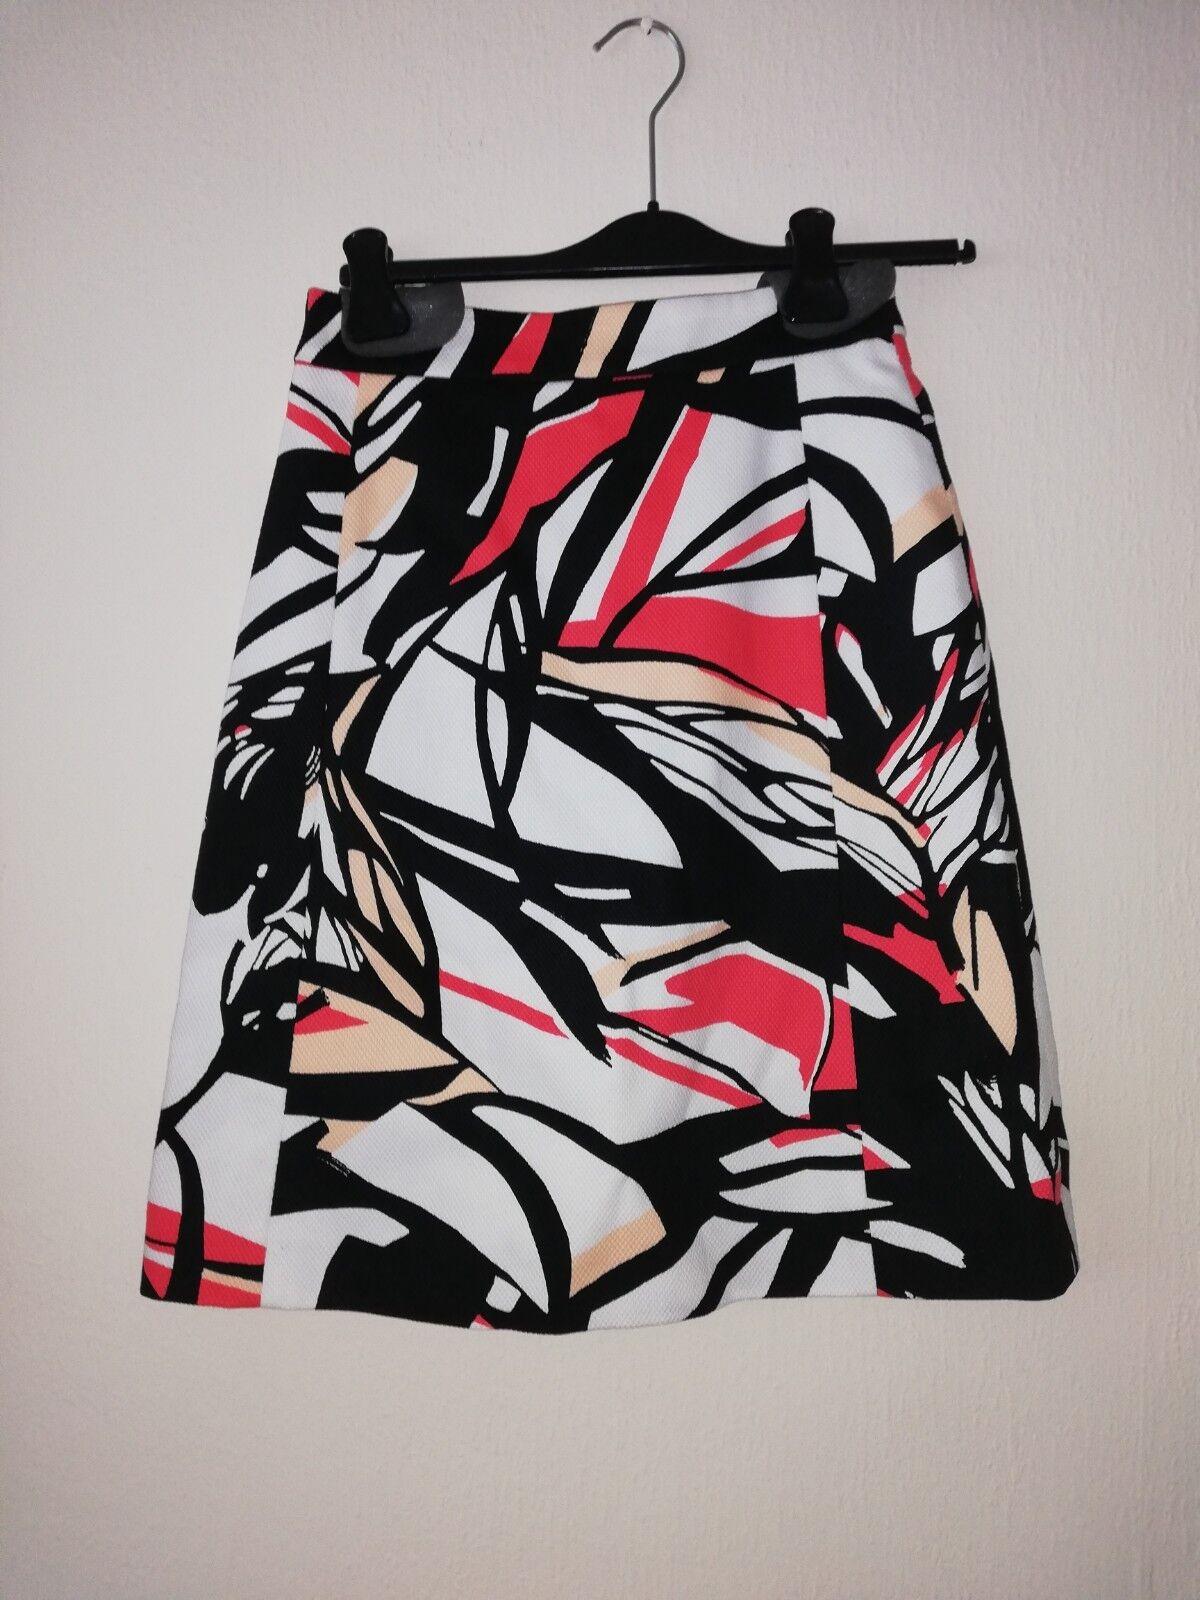 Hugo boss skirt (New with tags)